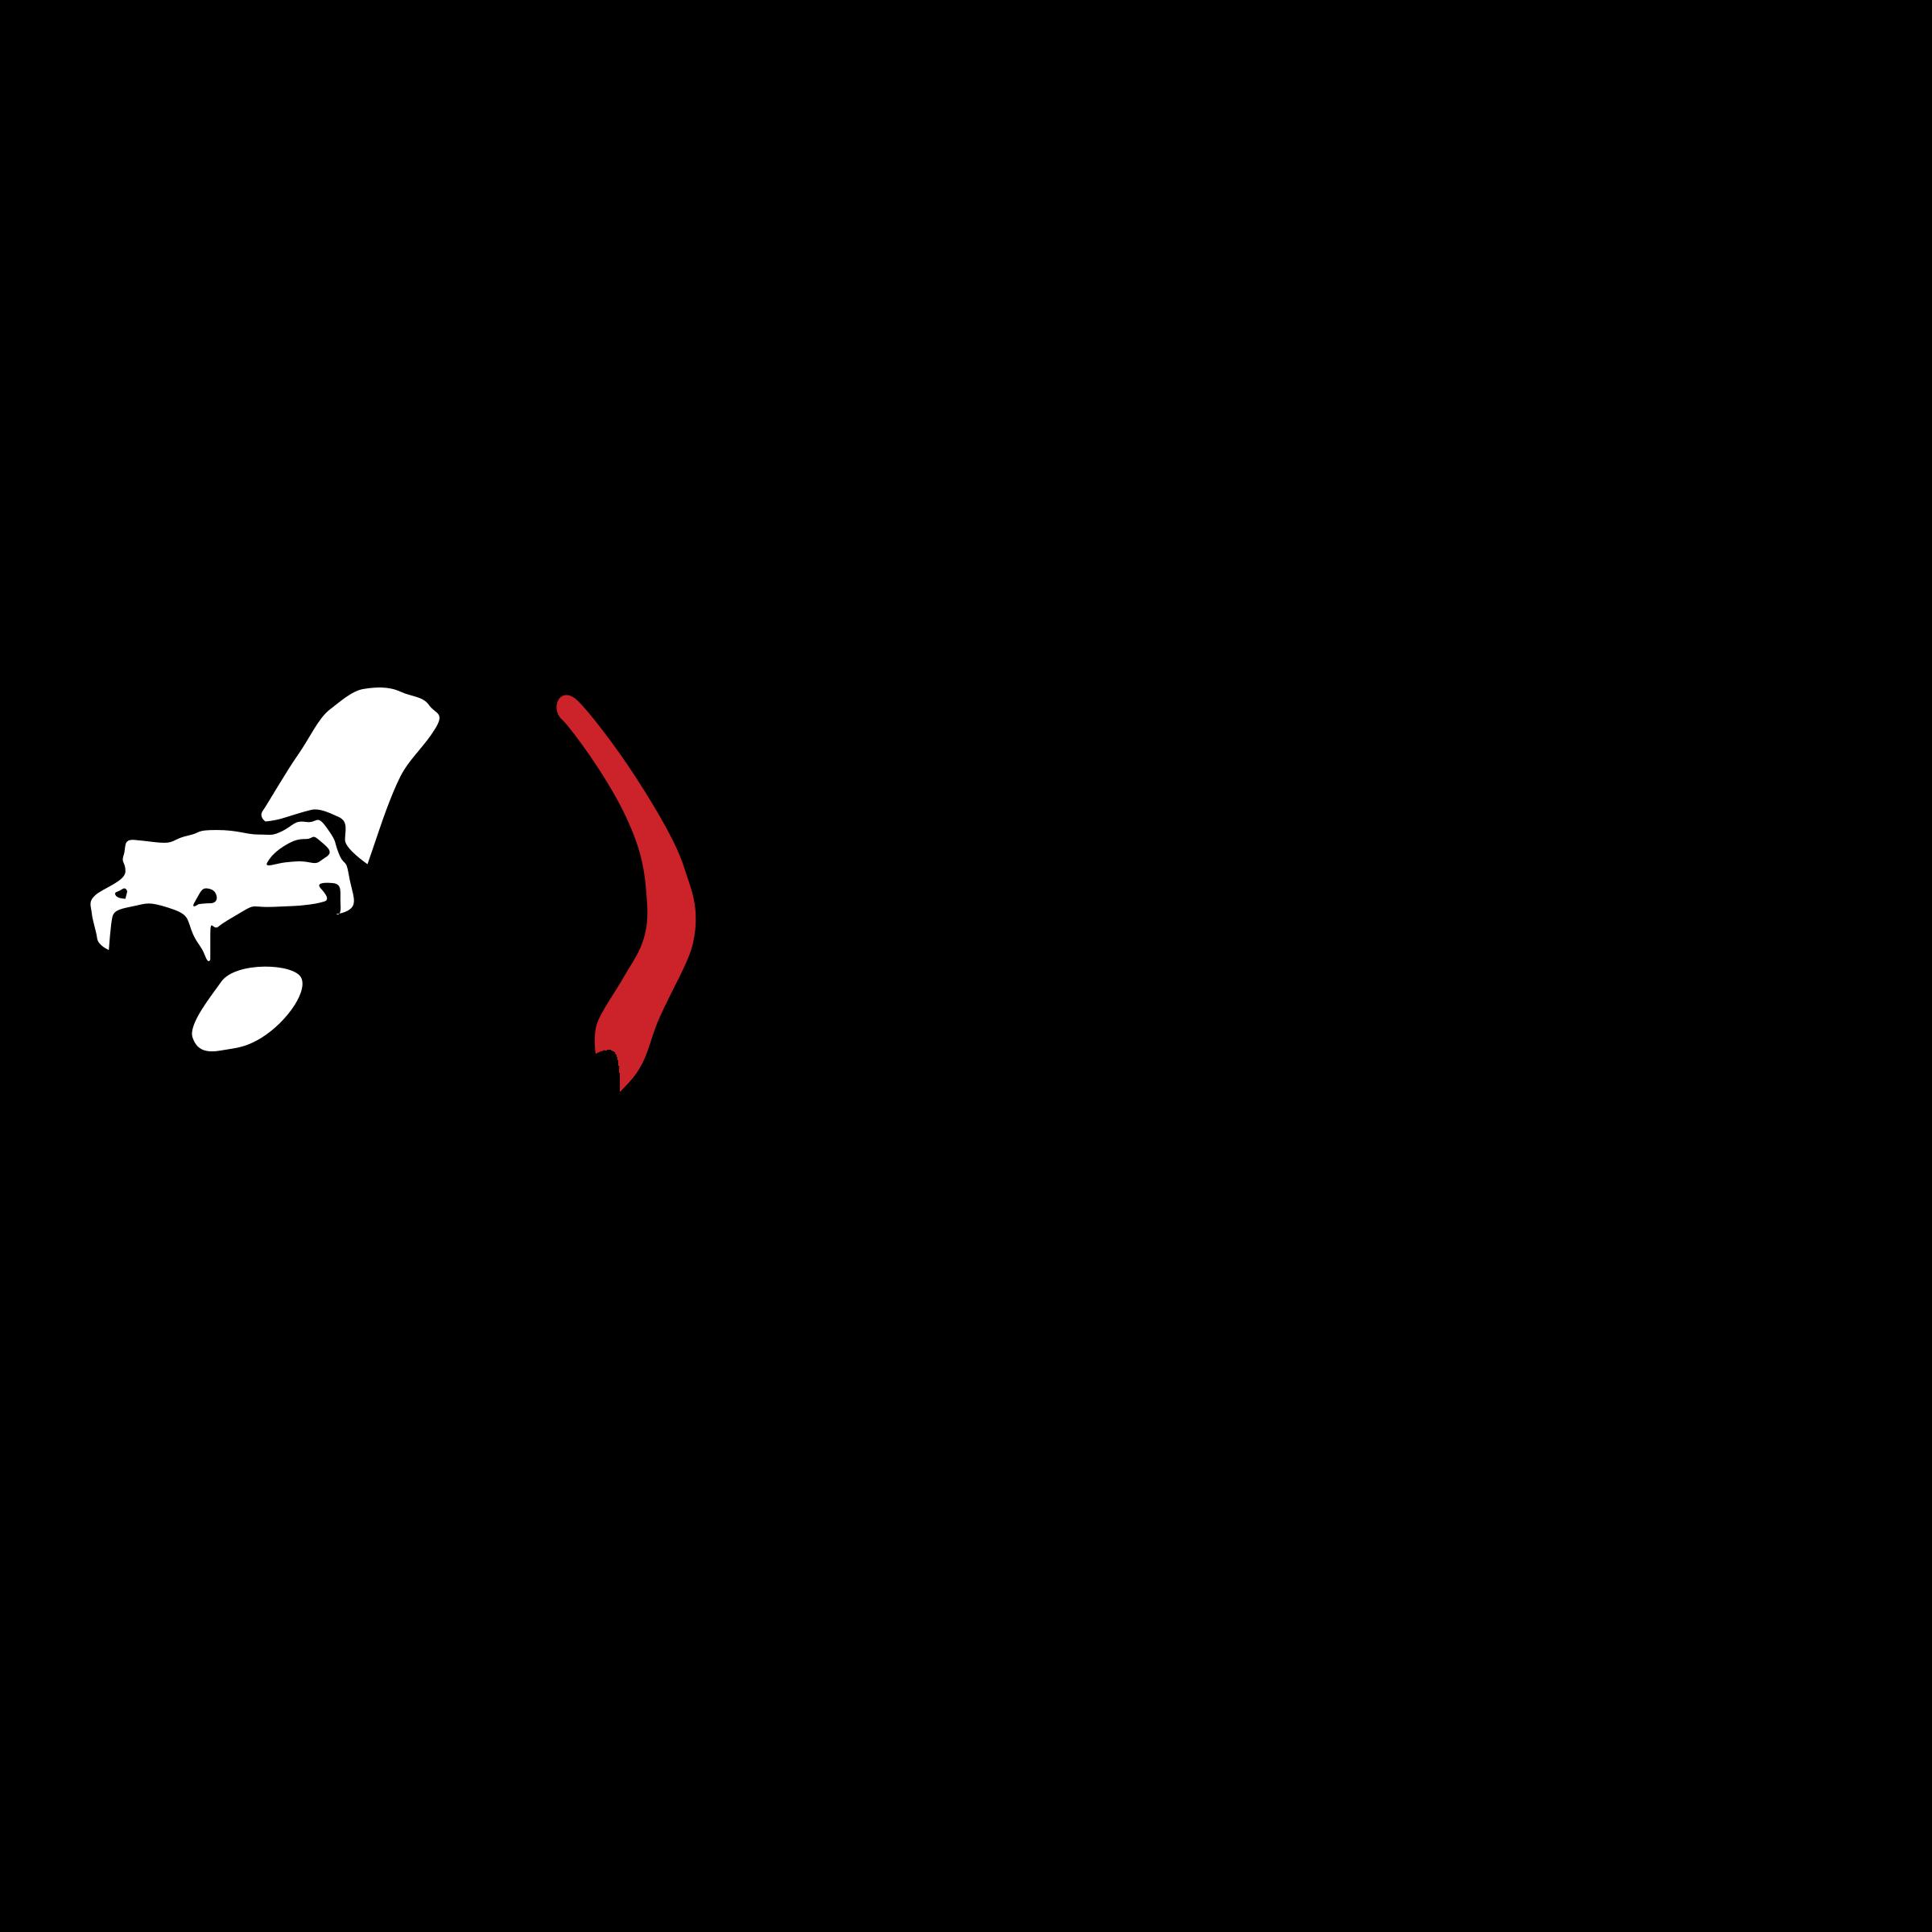 Redtail Logo PNG Transparent & SVG Vector - Freebie Supply